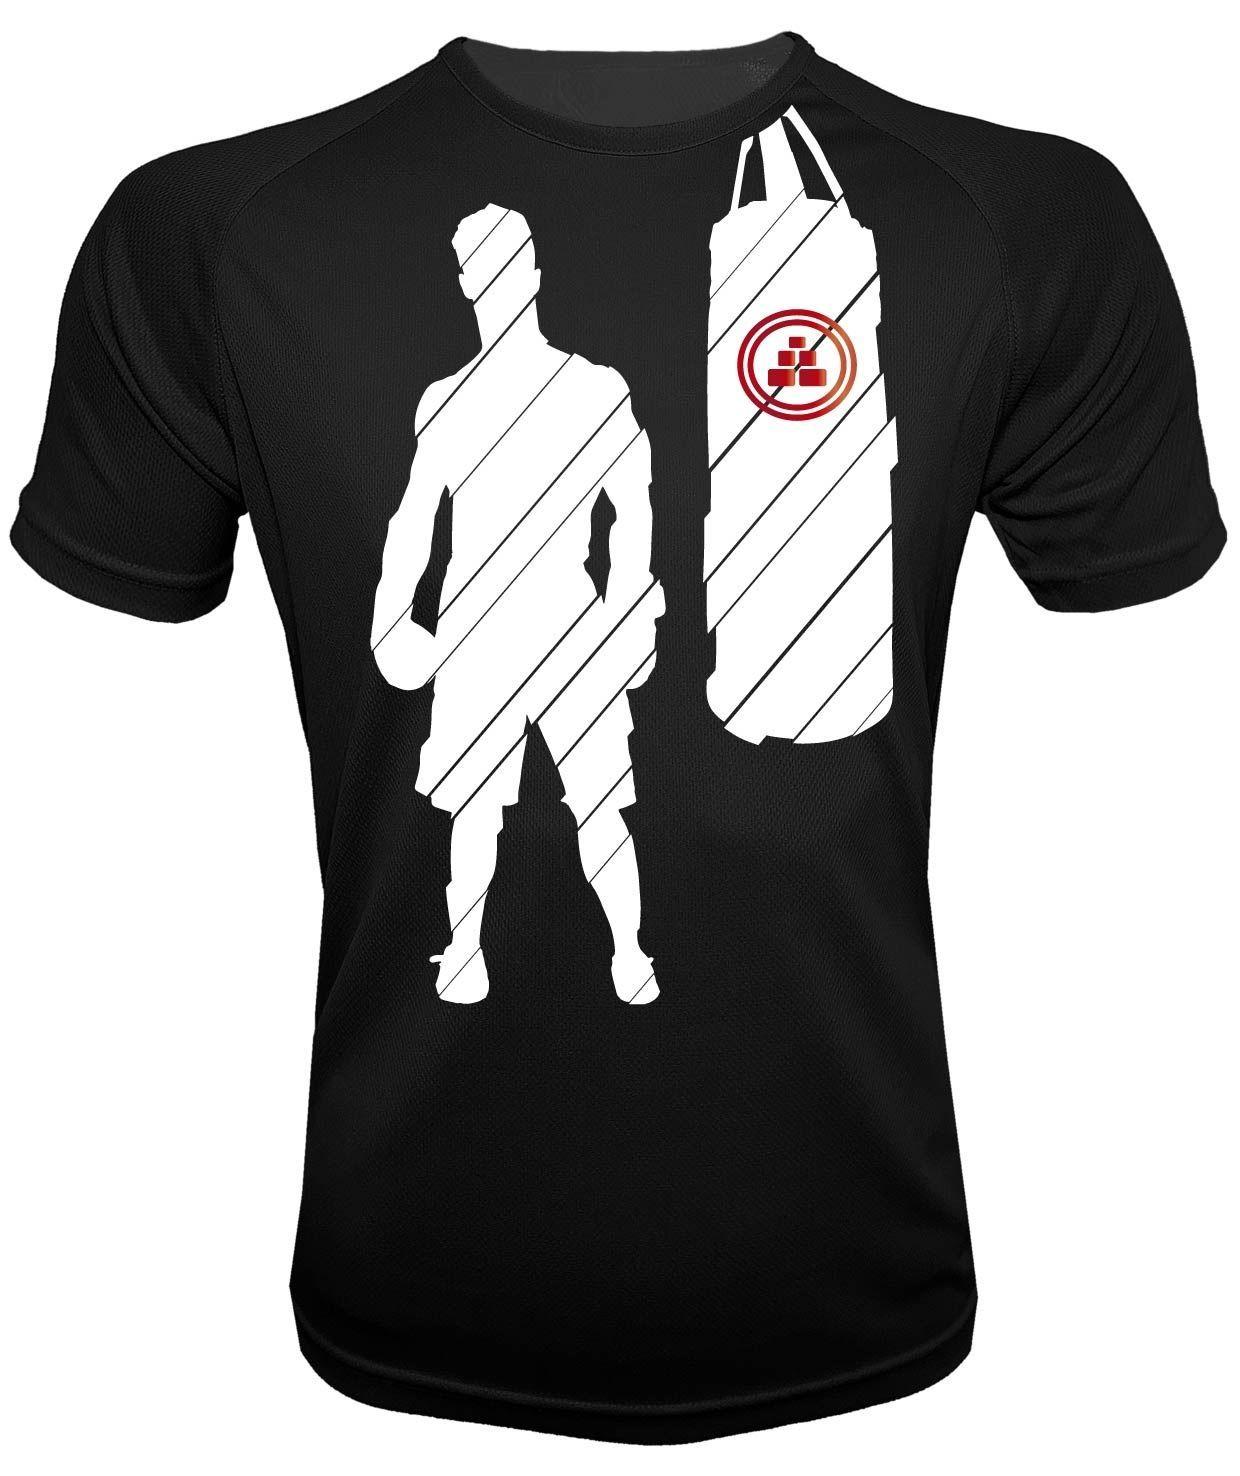 Camiseta de deporte boxeo con mangas